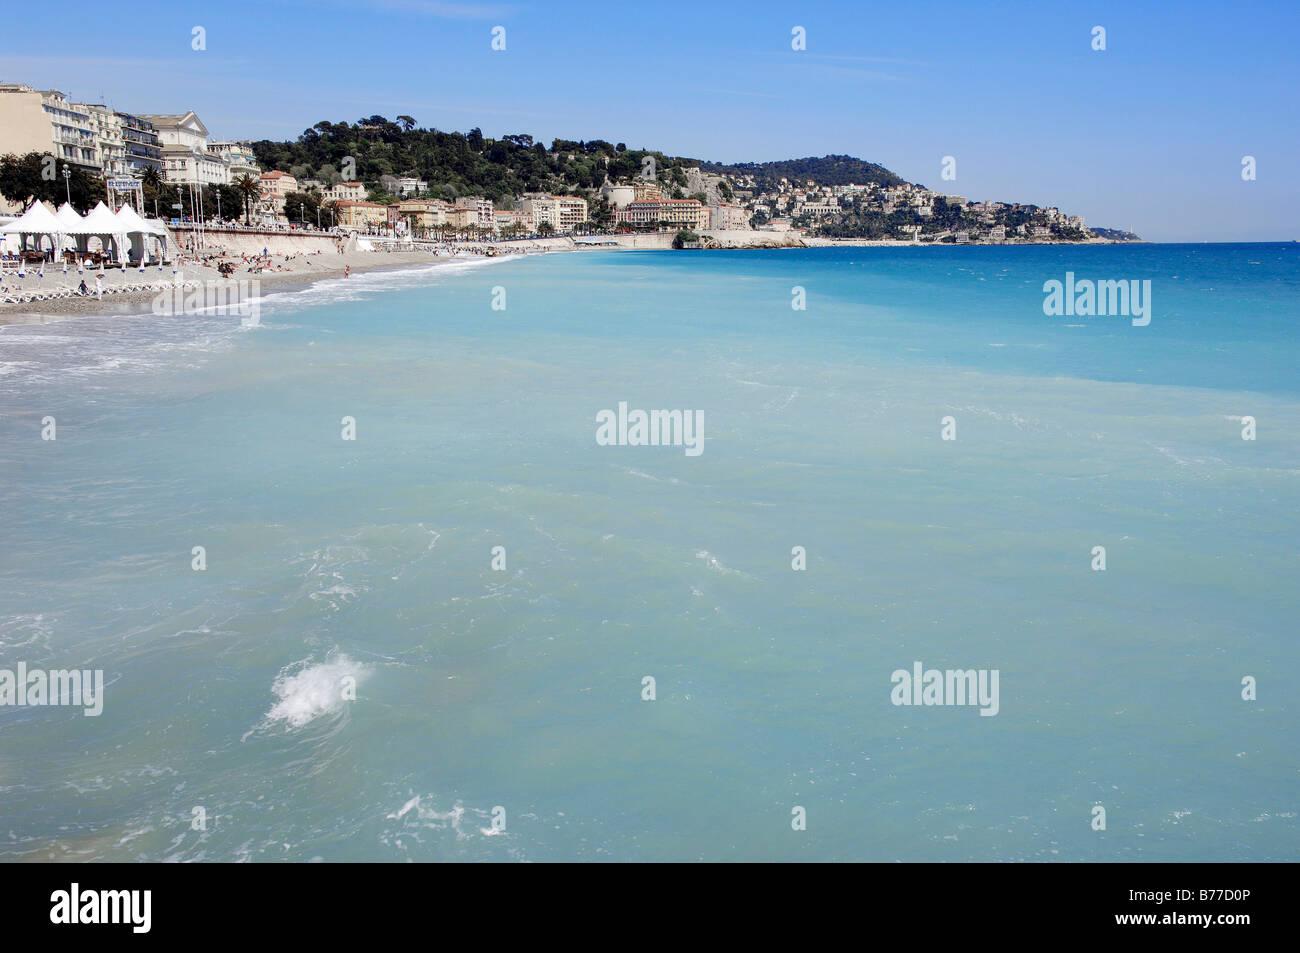 Seaside, Nice, Alpes-Maritimes, Provence-Alpes-Cote d'Azur, Southern France, France, Europe - Stock Image